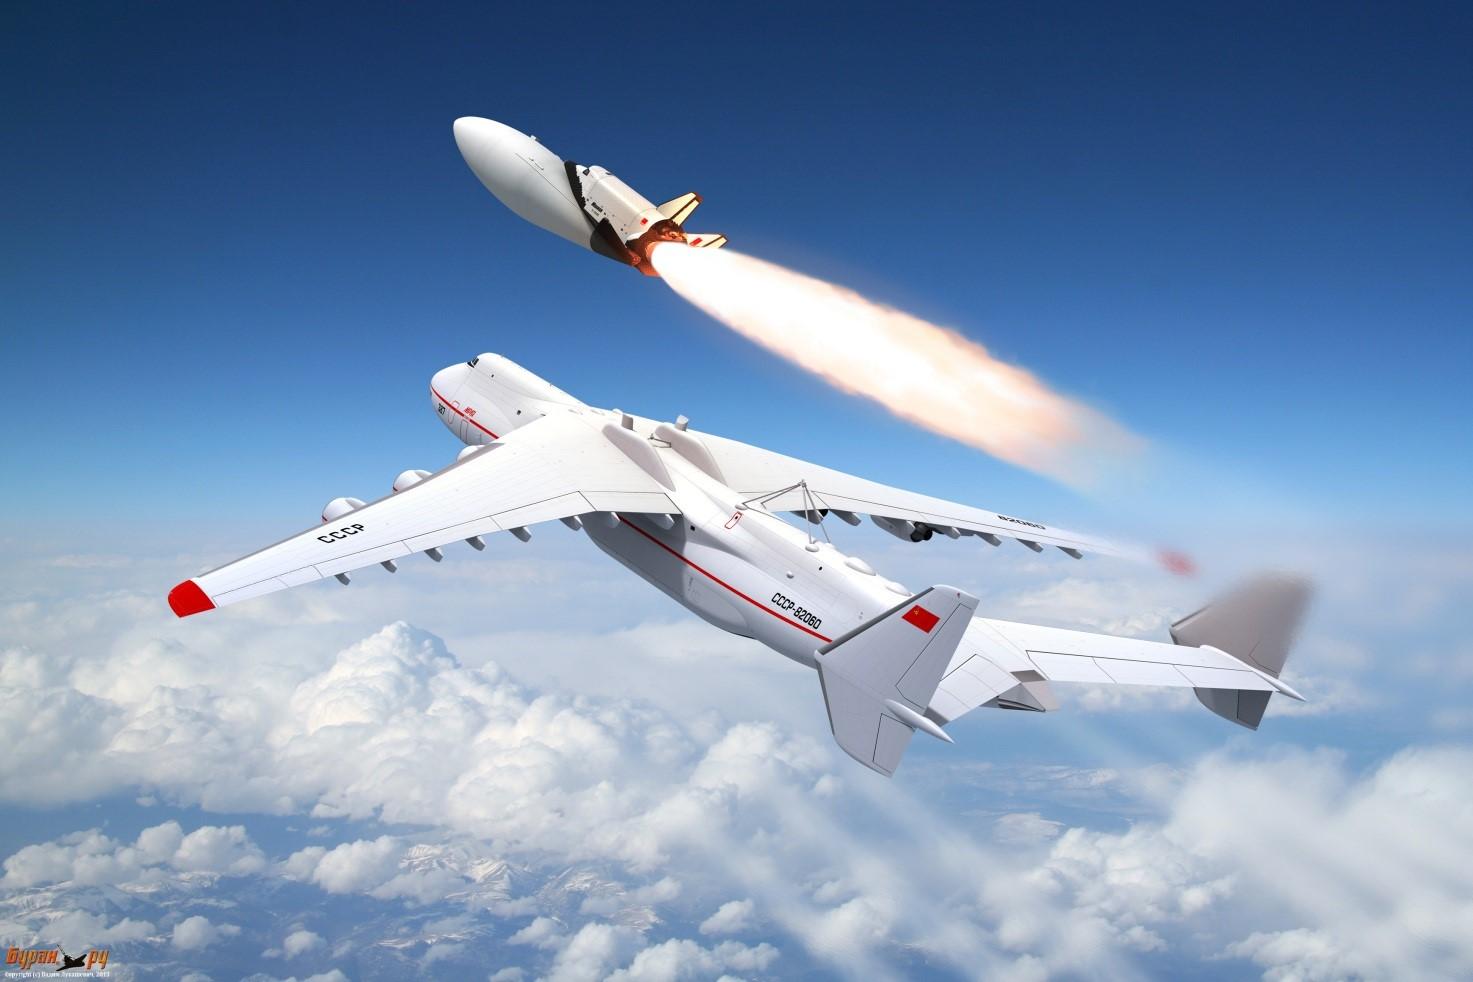 Cамолет  Ан-225 «Мрія» — несбывшаяся мечта